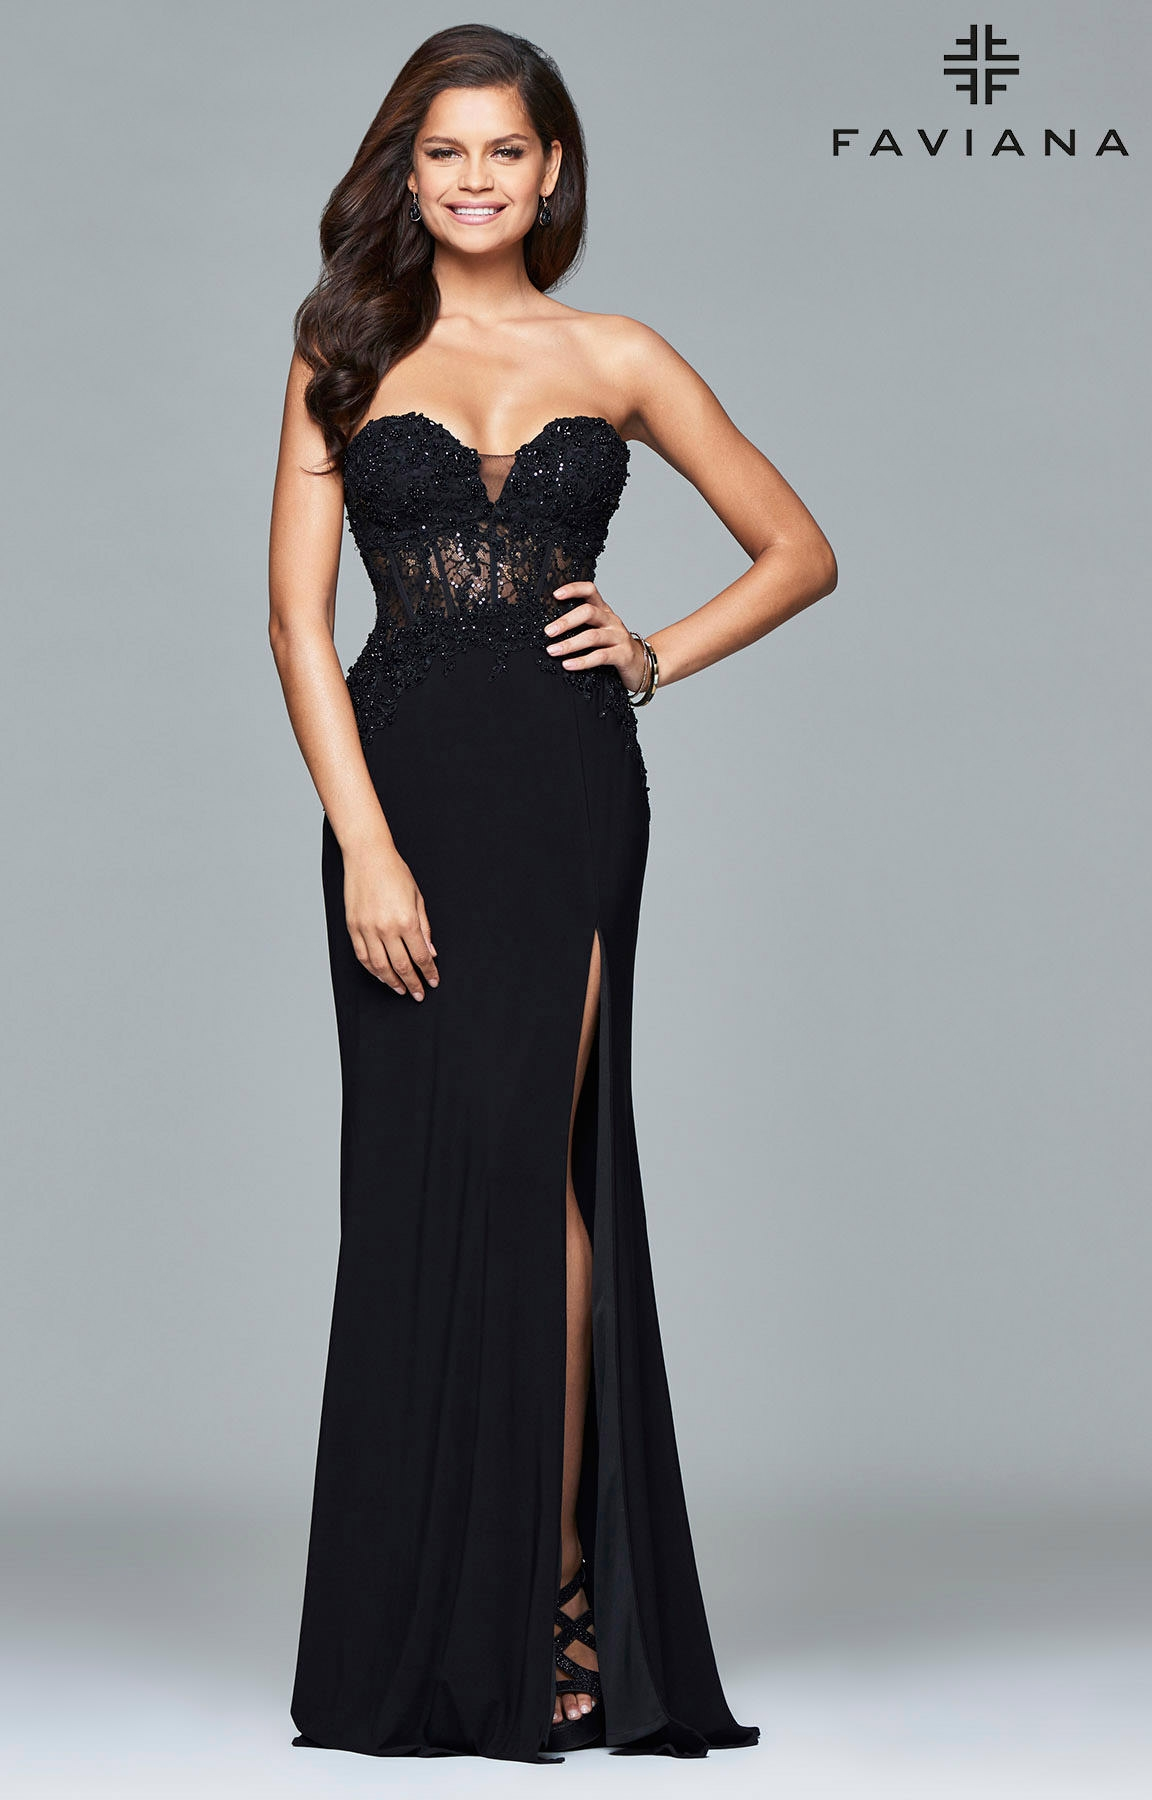 Faviana S7907 Corset Style Strapless Dress Prom Dress